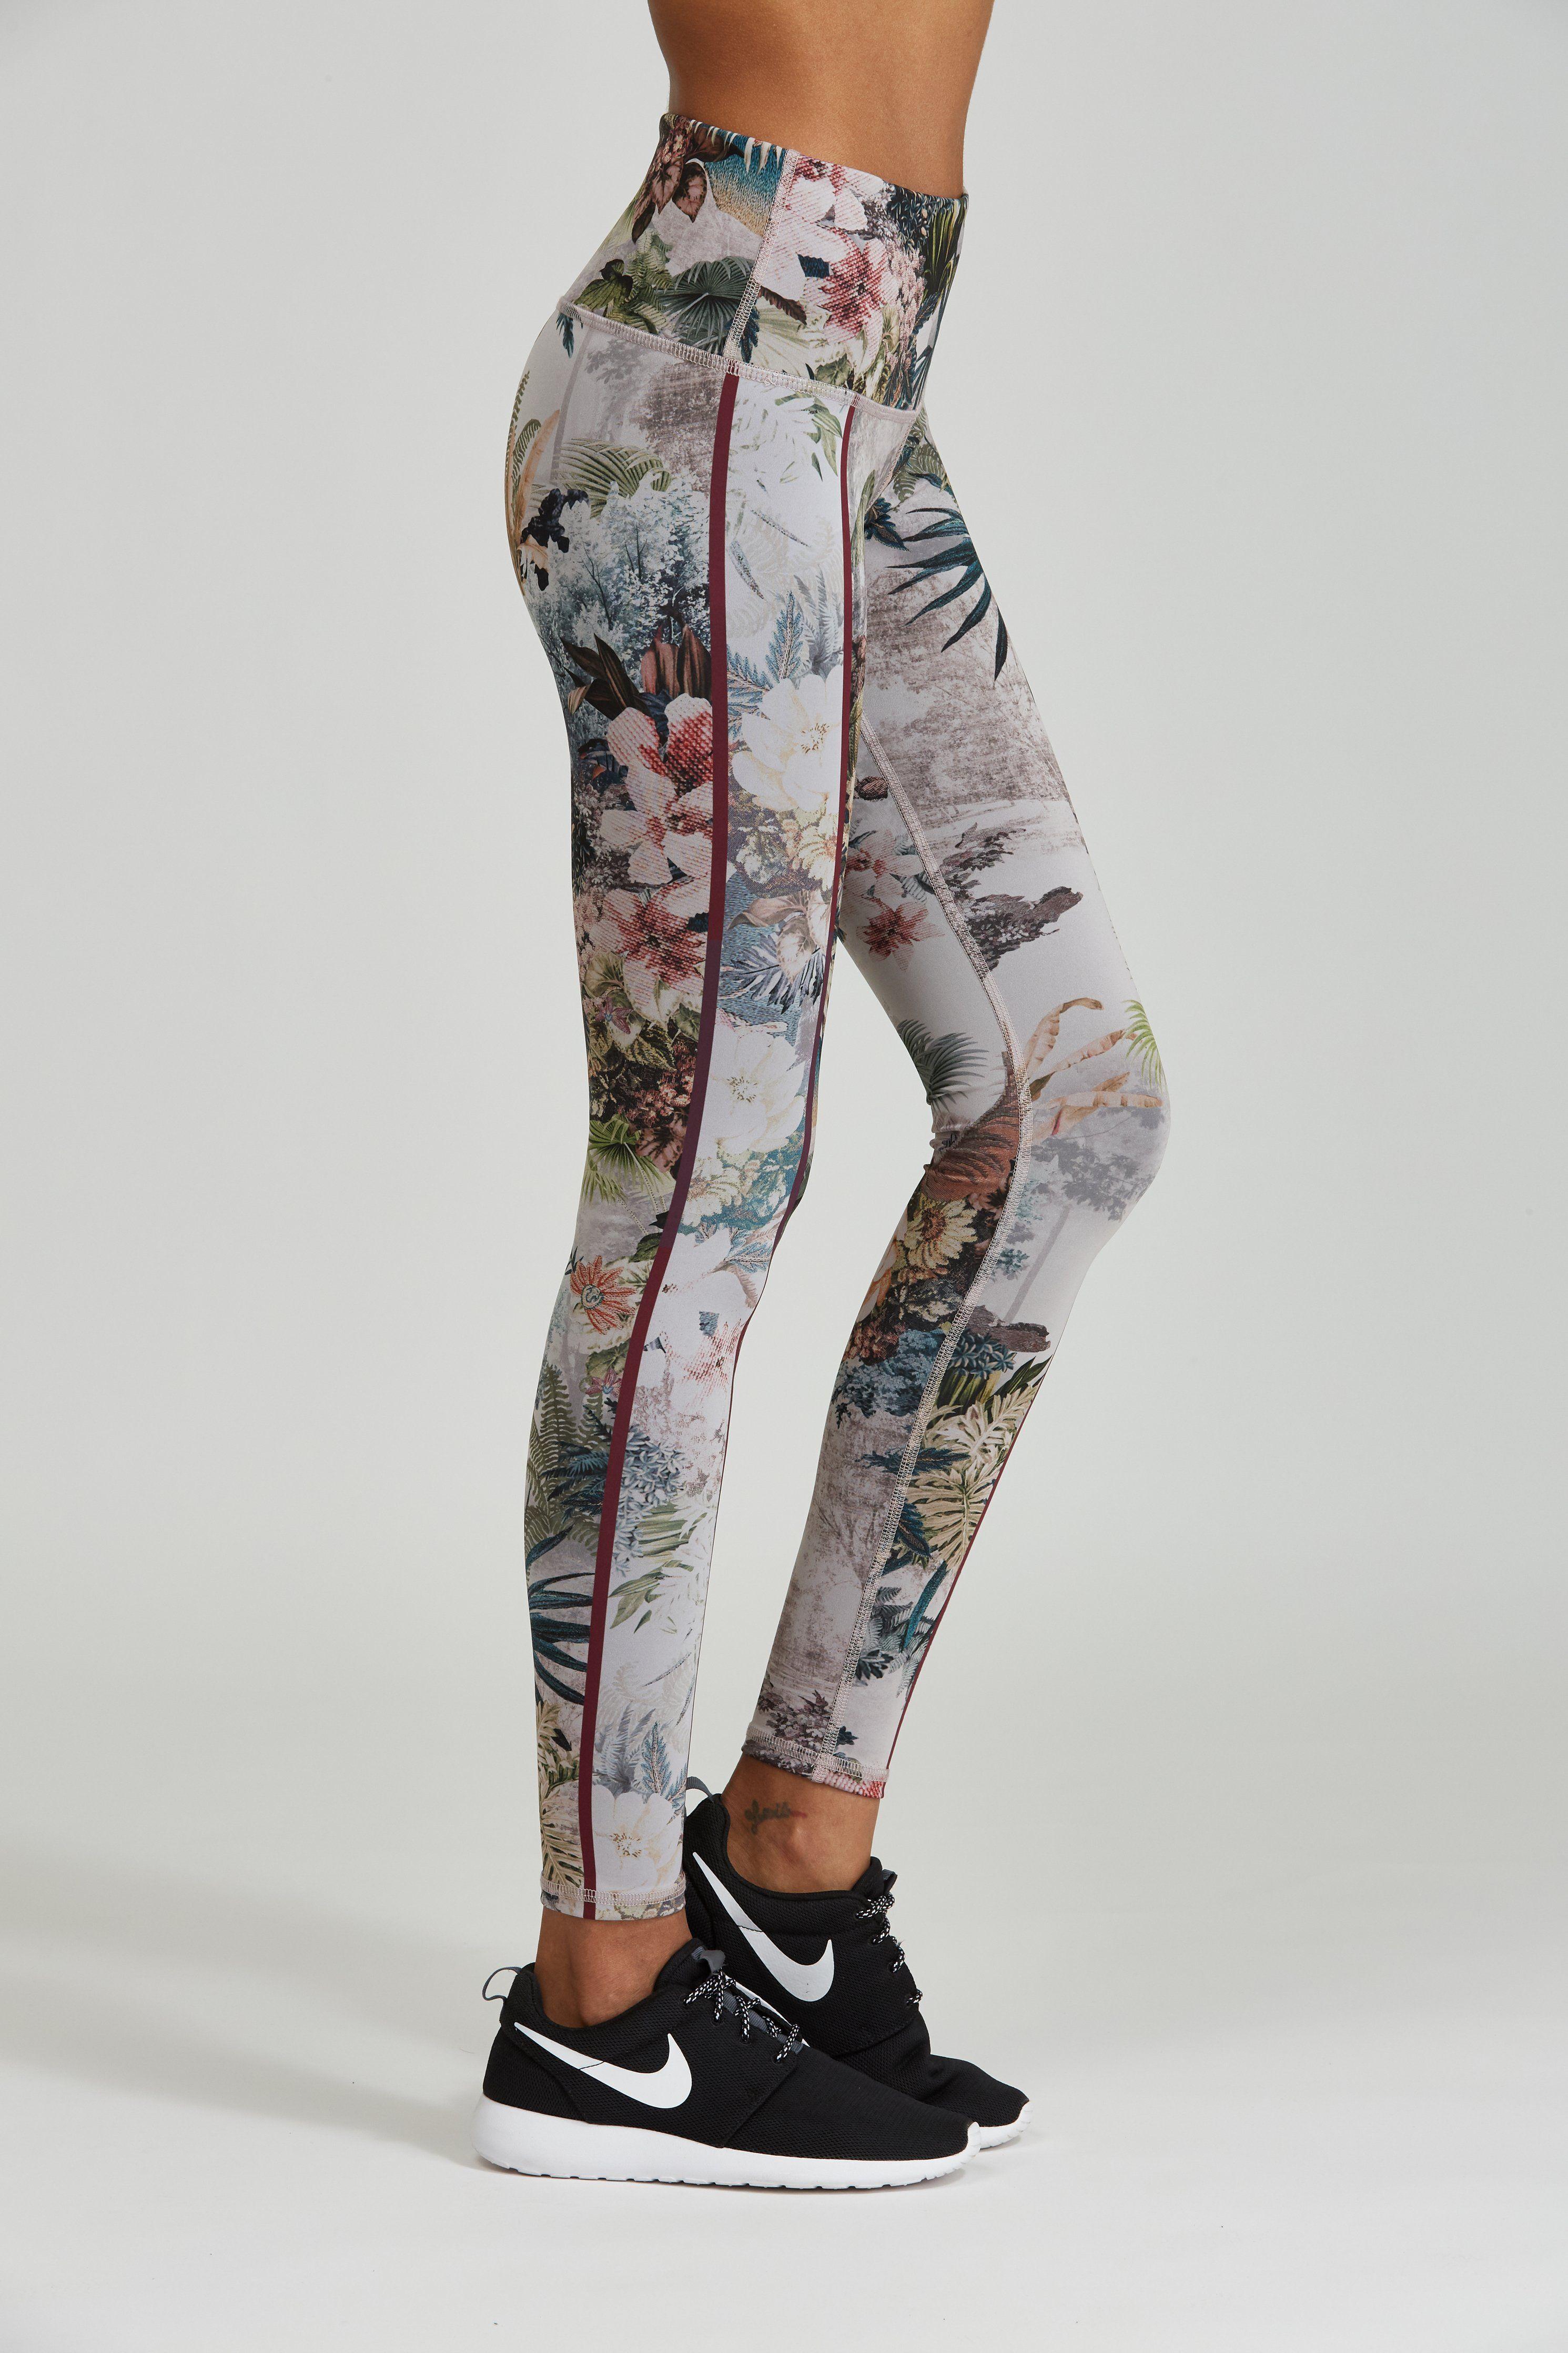 ed756aac3282d Milano Legging in 2019   Activewear - Naomi   Soft fabrics, Yoga ...